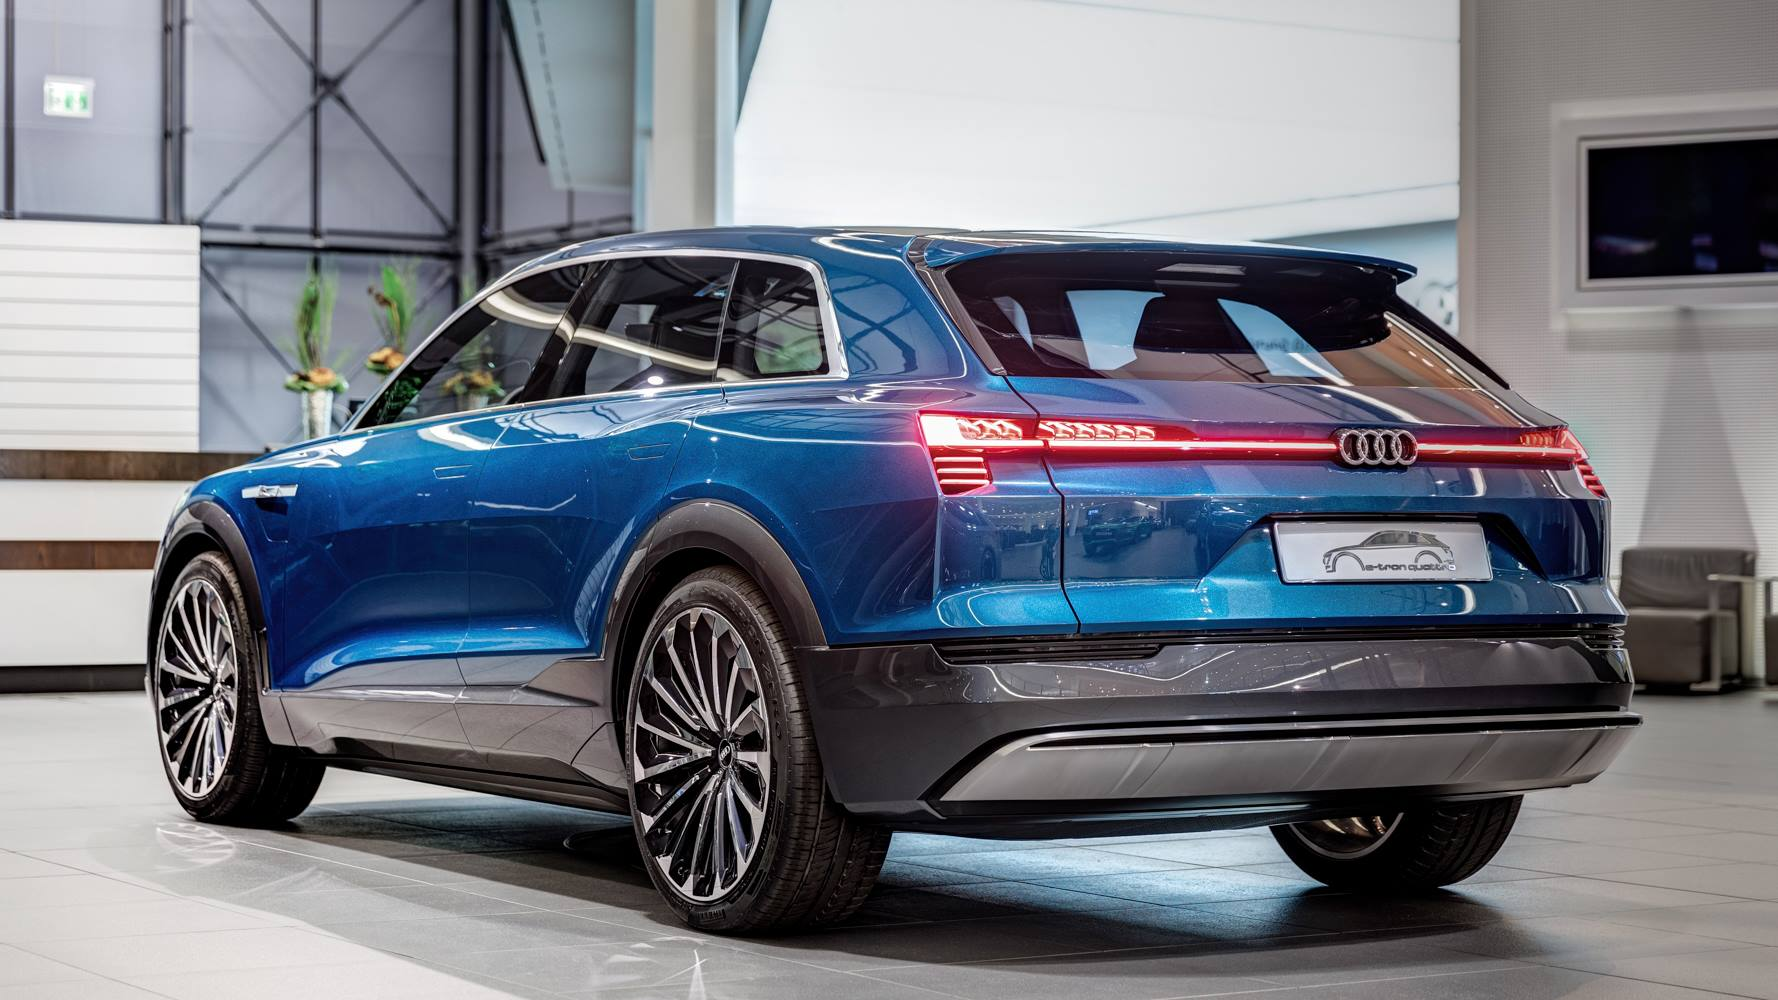 Audi Sport Electric Vehicle Coming In Autoevolution - Audi r8 suv price